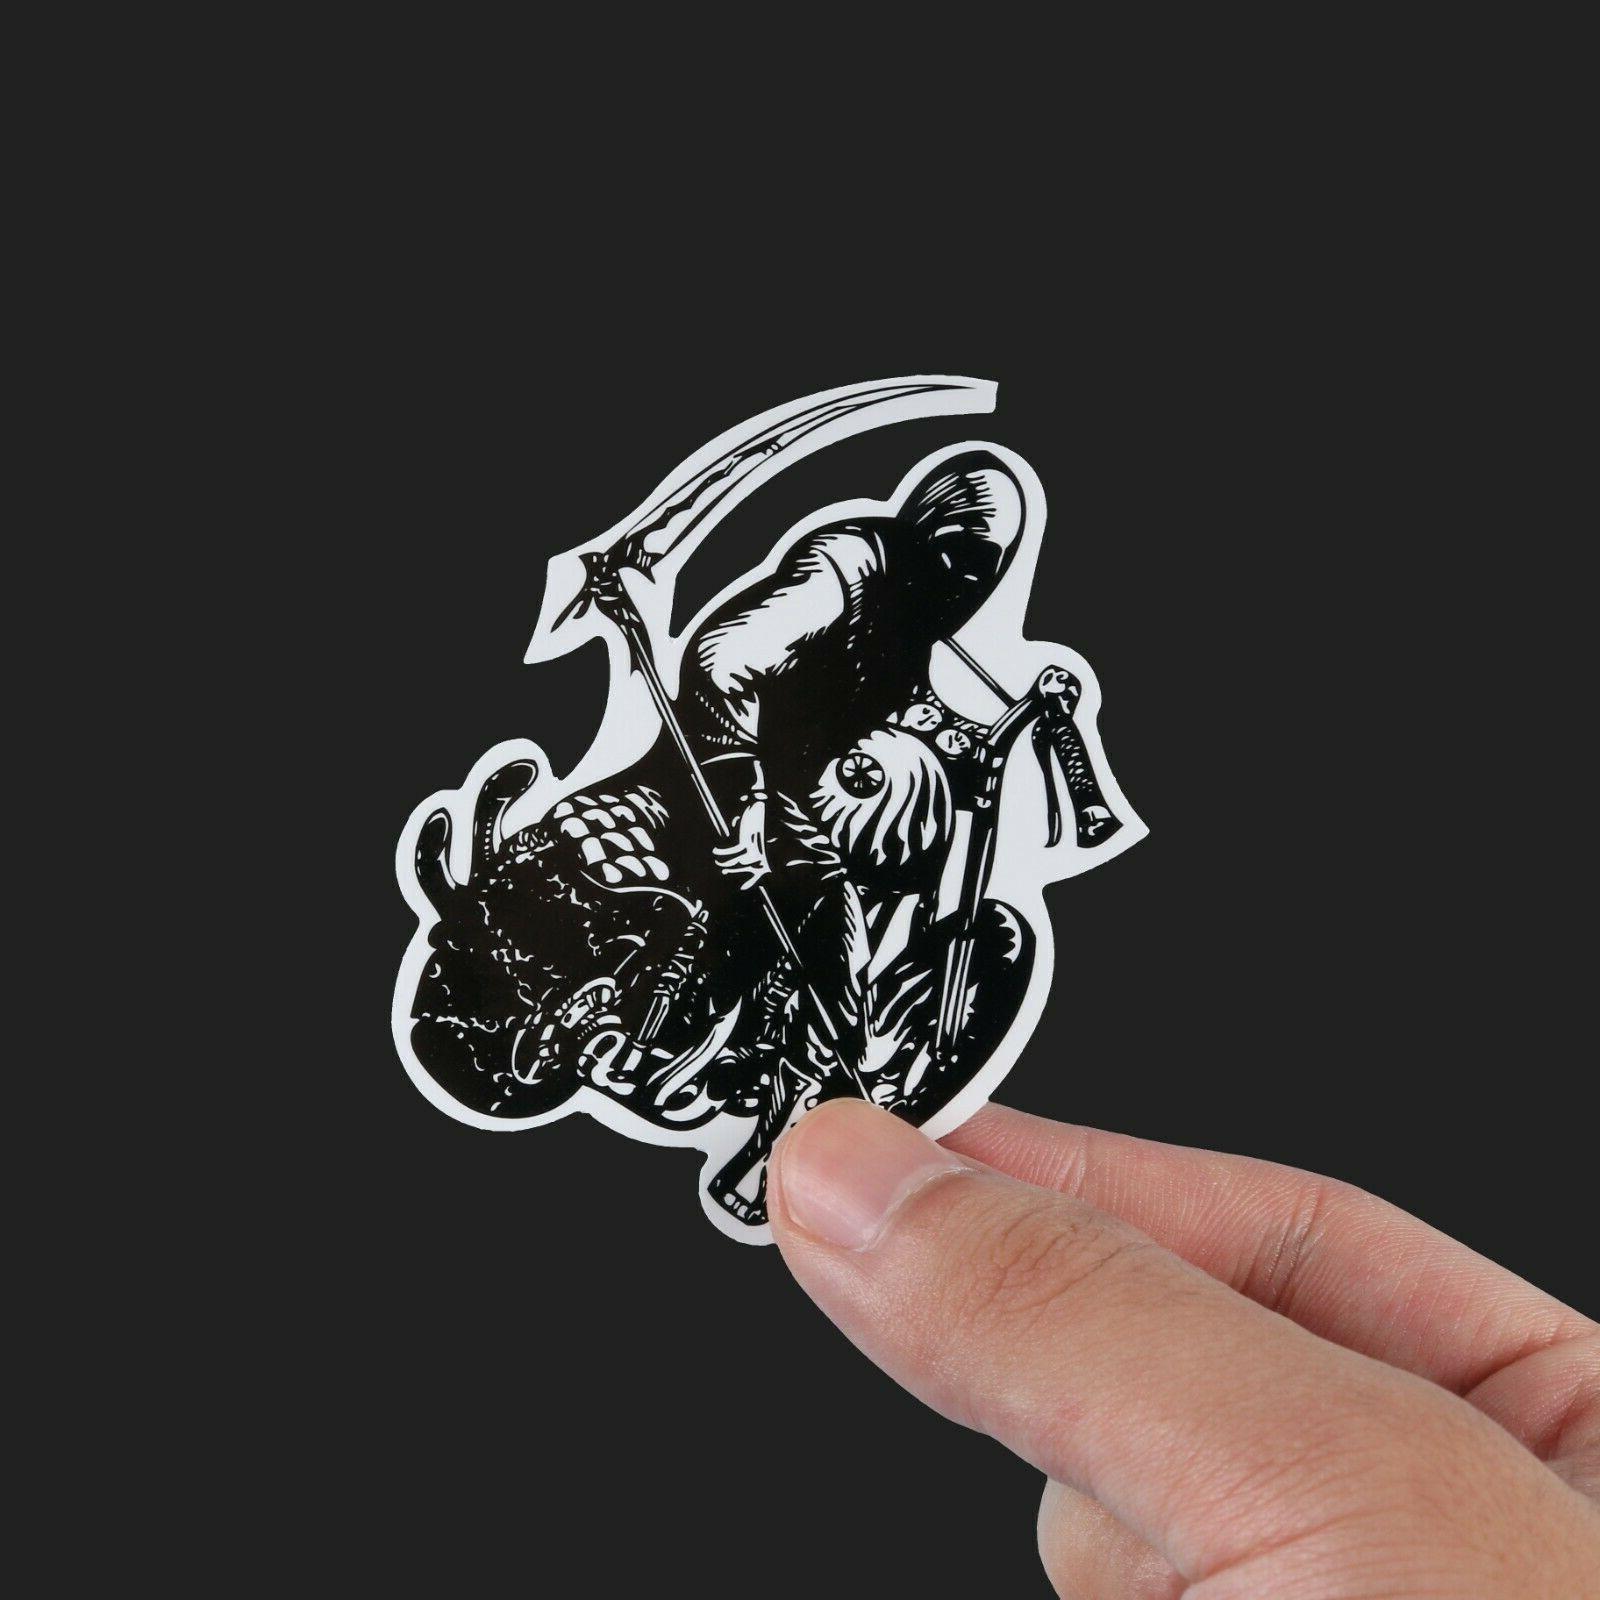 60pcs Stickers